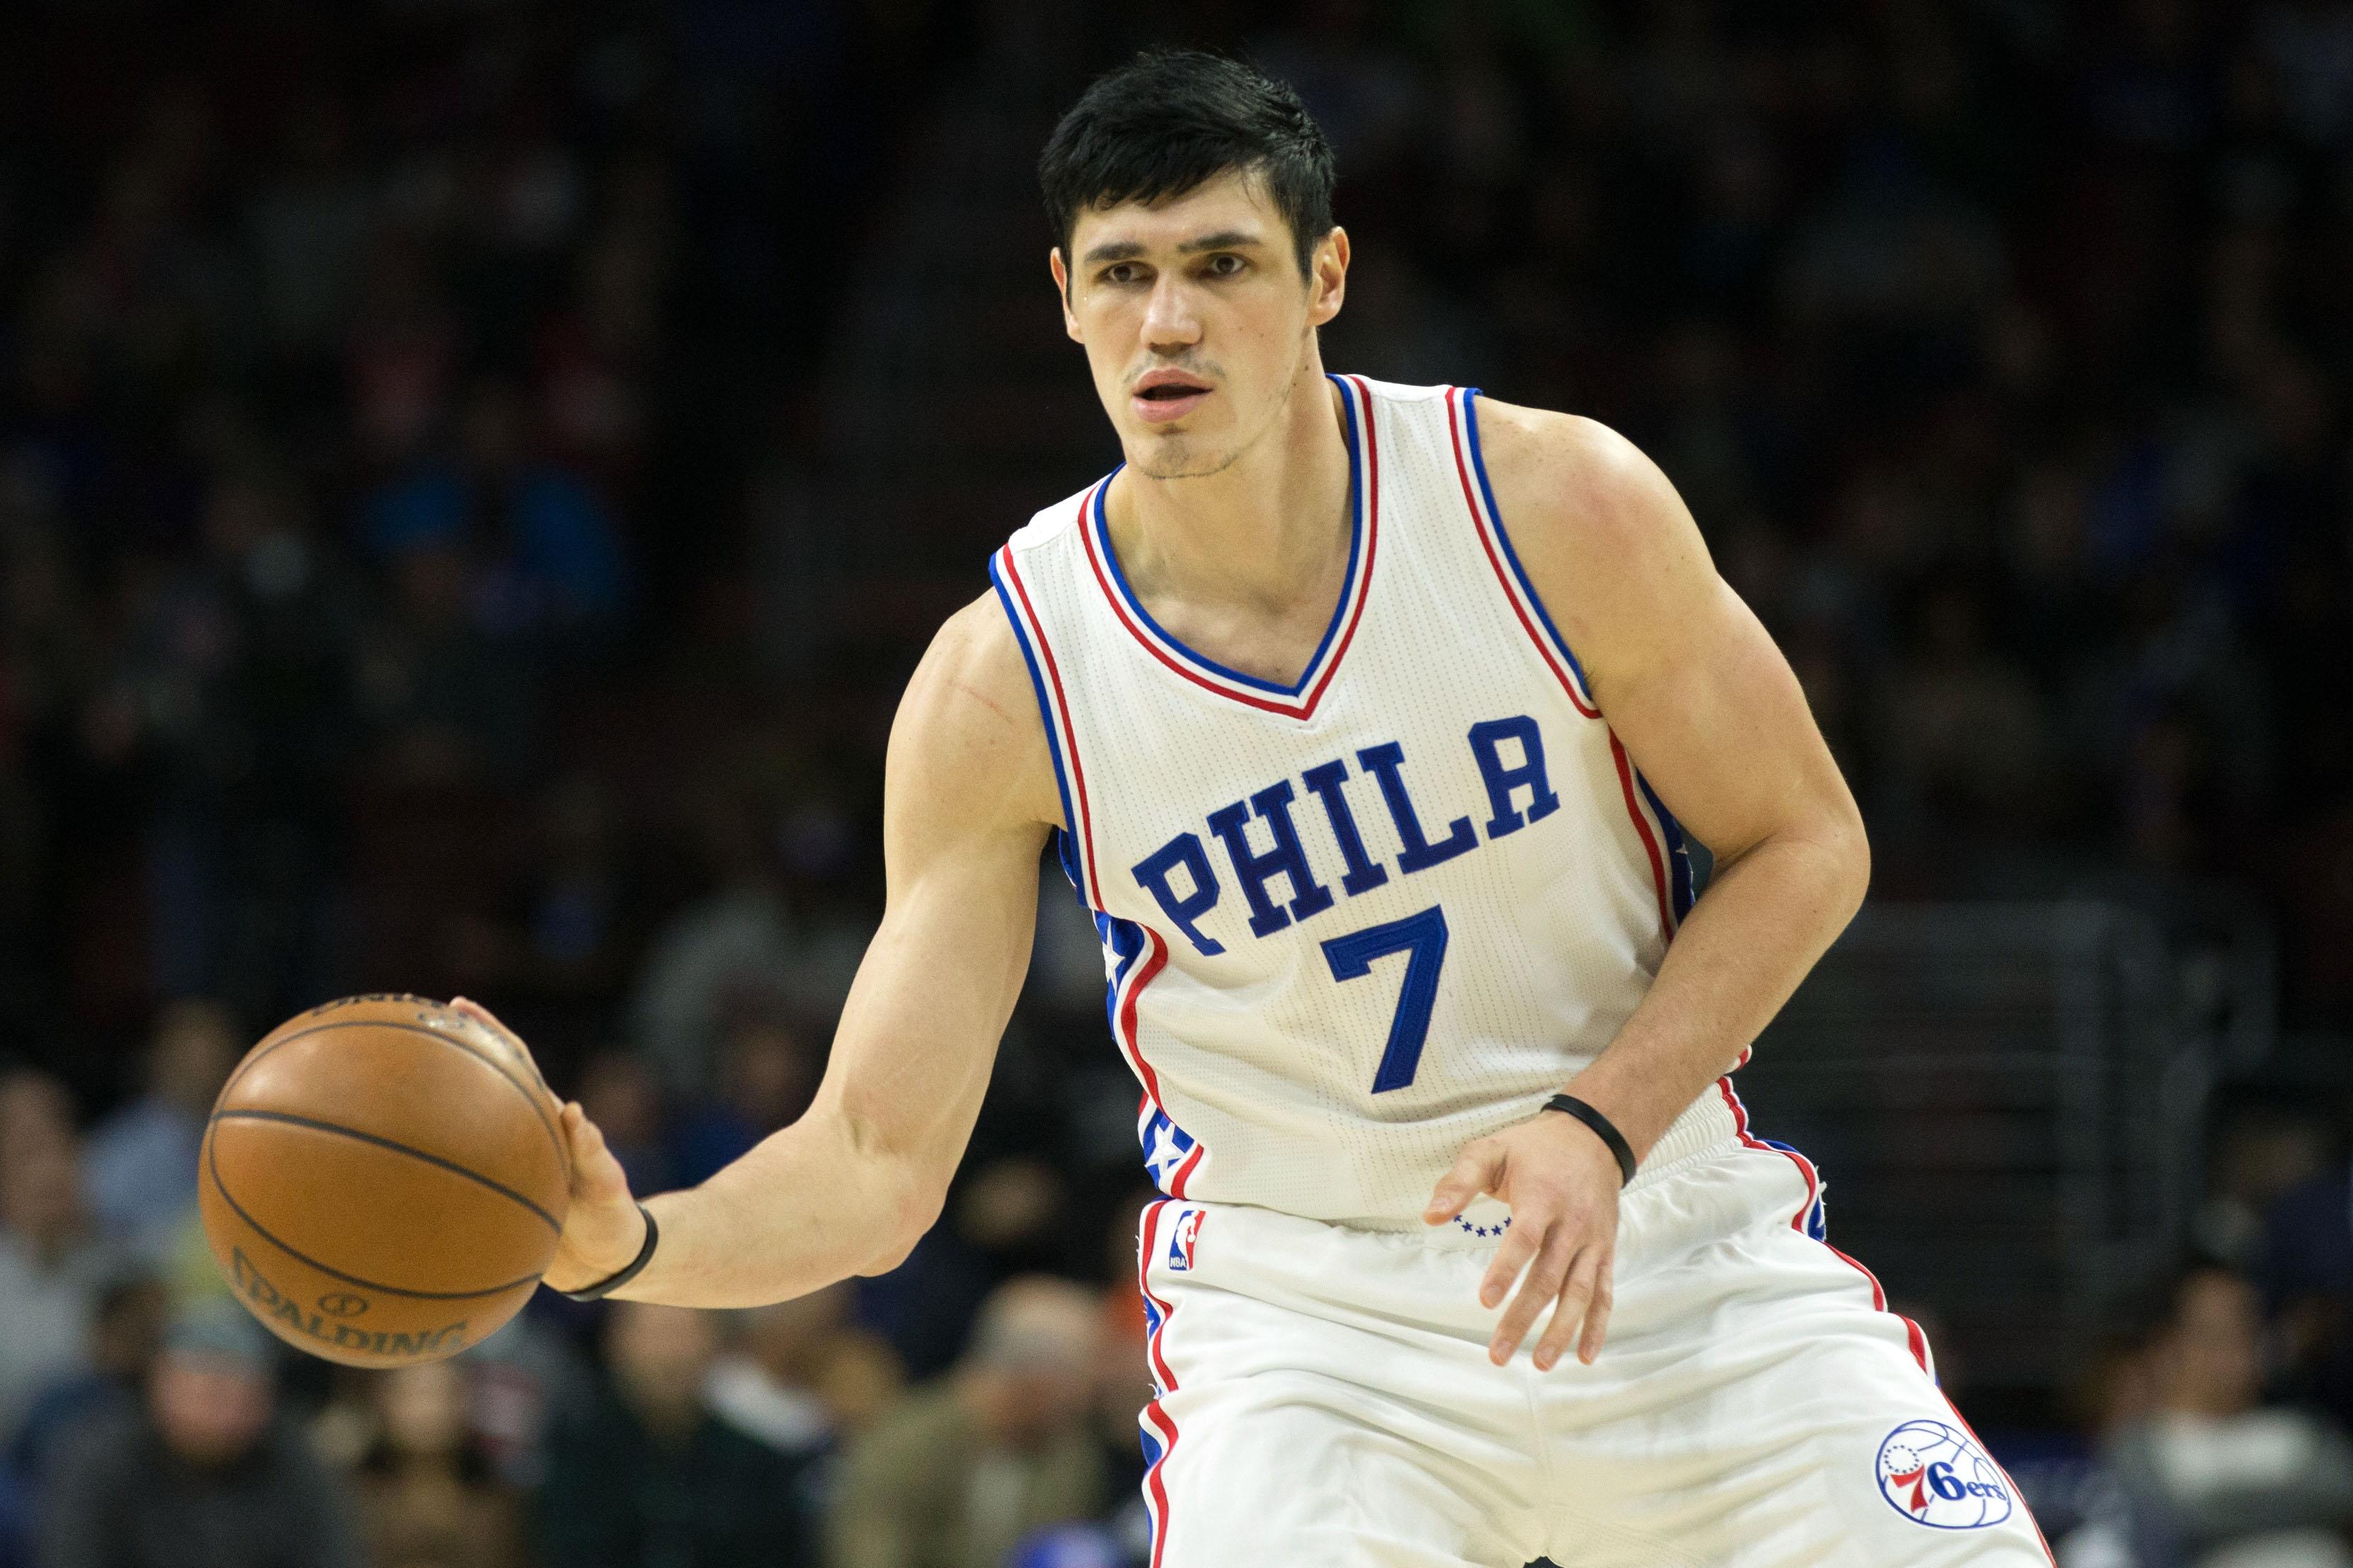 Hawks trade Tiago Splitter, draft picks to Sixers for Ersan Ilyasova